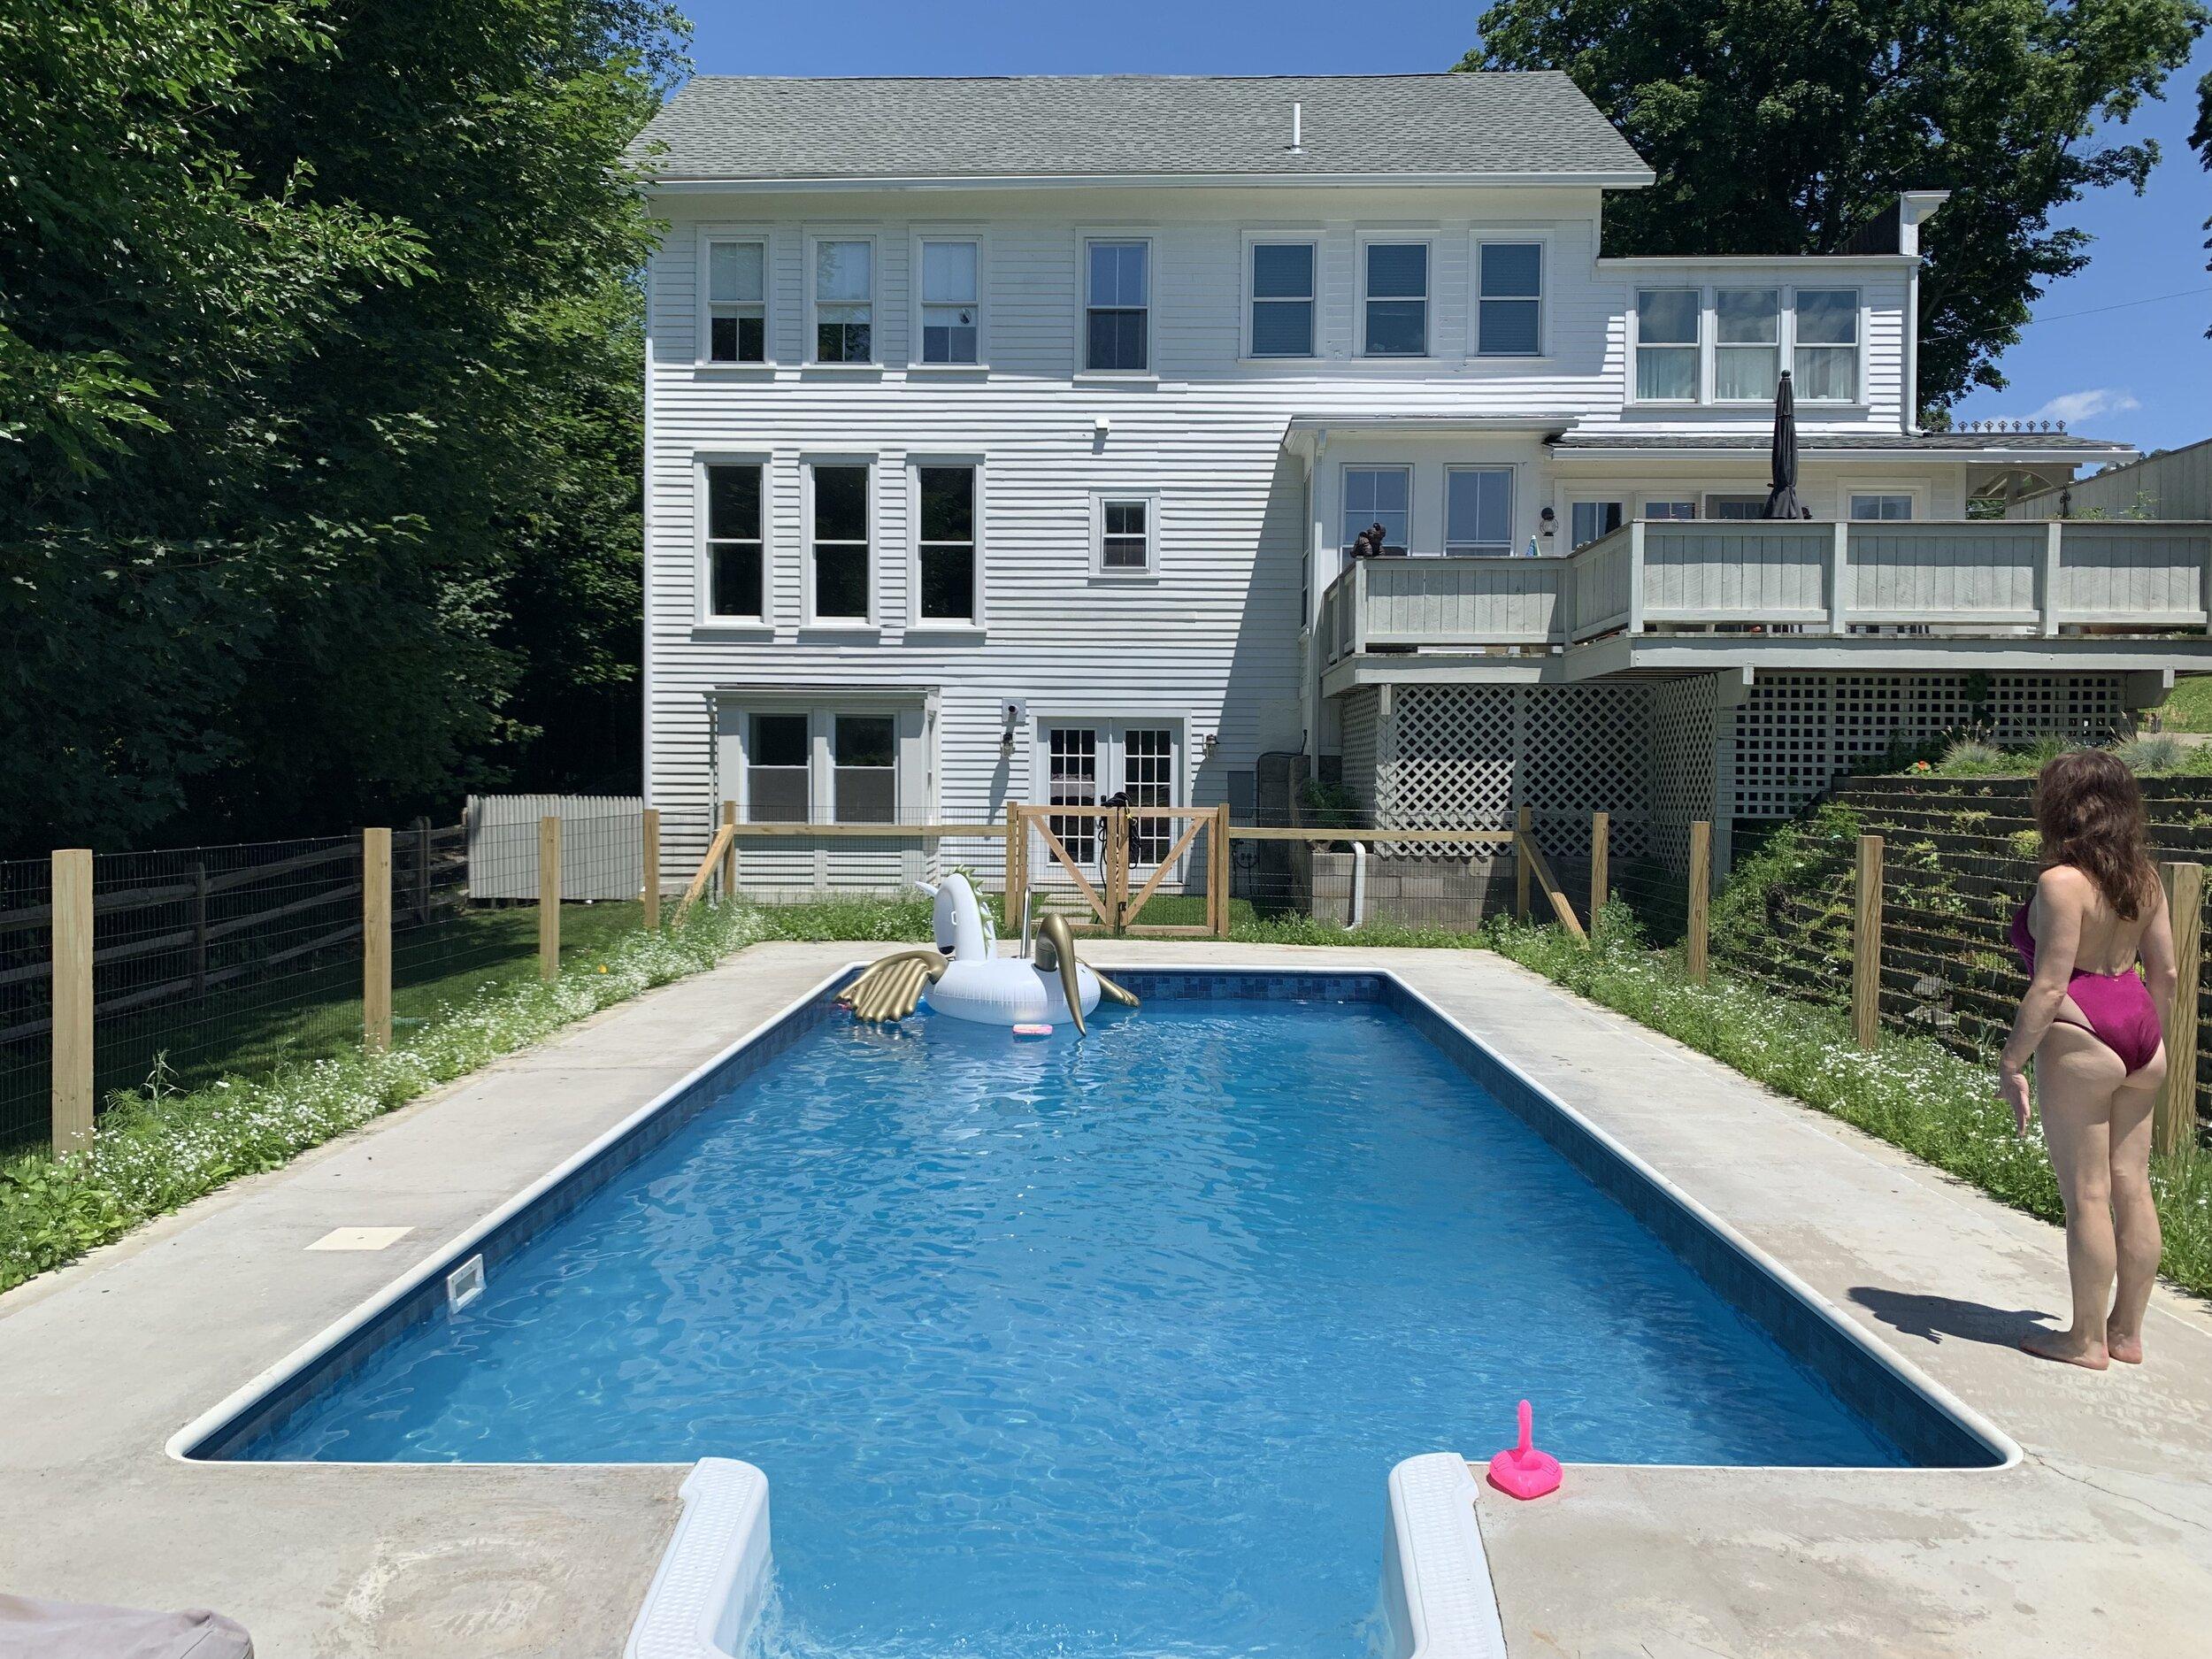 The pool at Quinn & Simon's home.